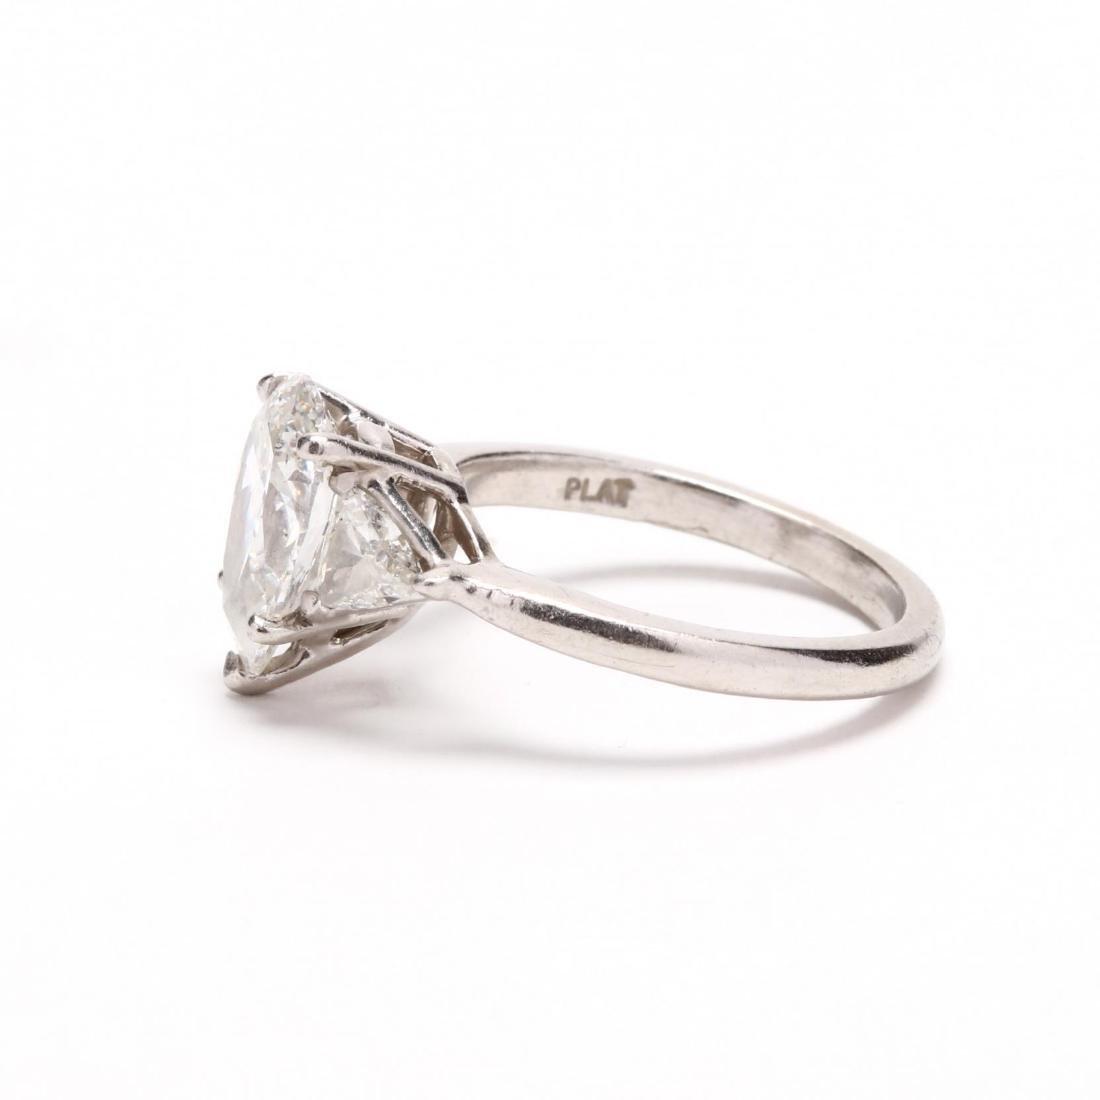 Unmounted Diamond with Platinum and Diamond Mount - 4